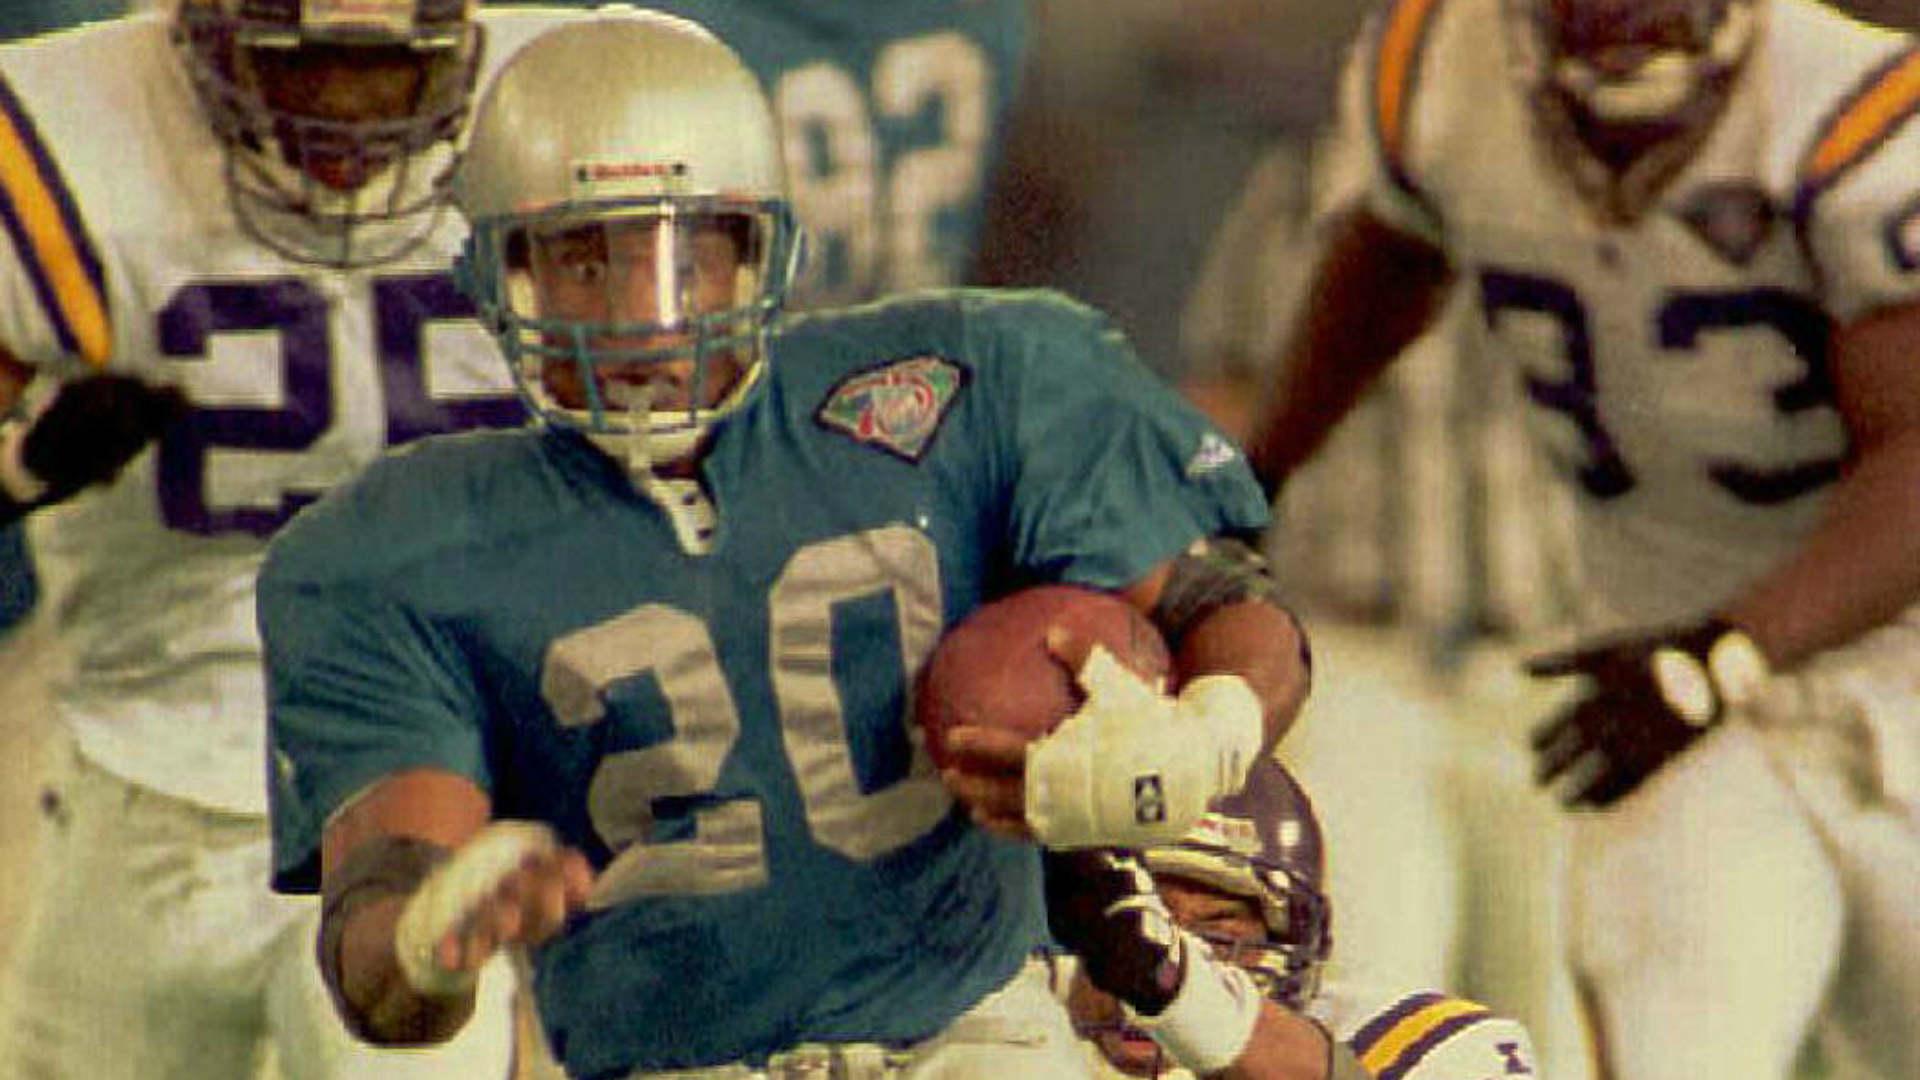 NFL throwback uniform rankings: The 20 best vintage looks in the ...